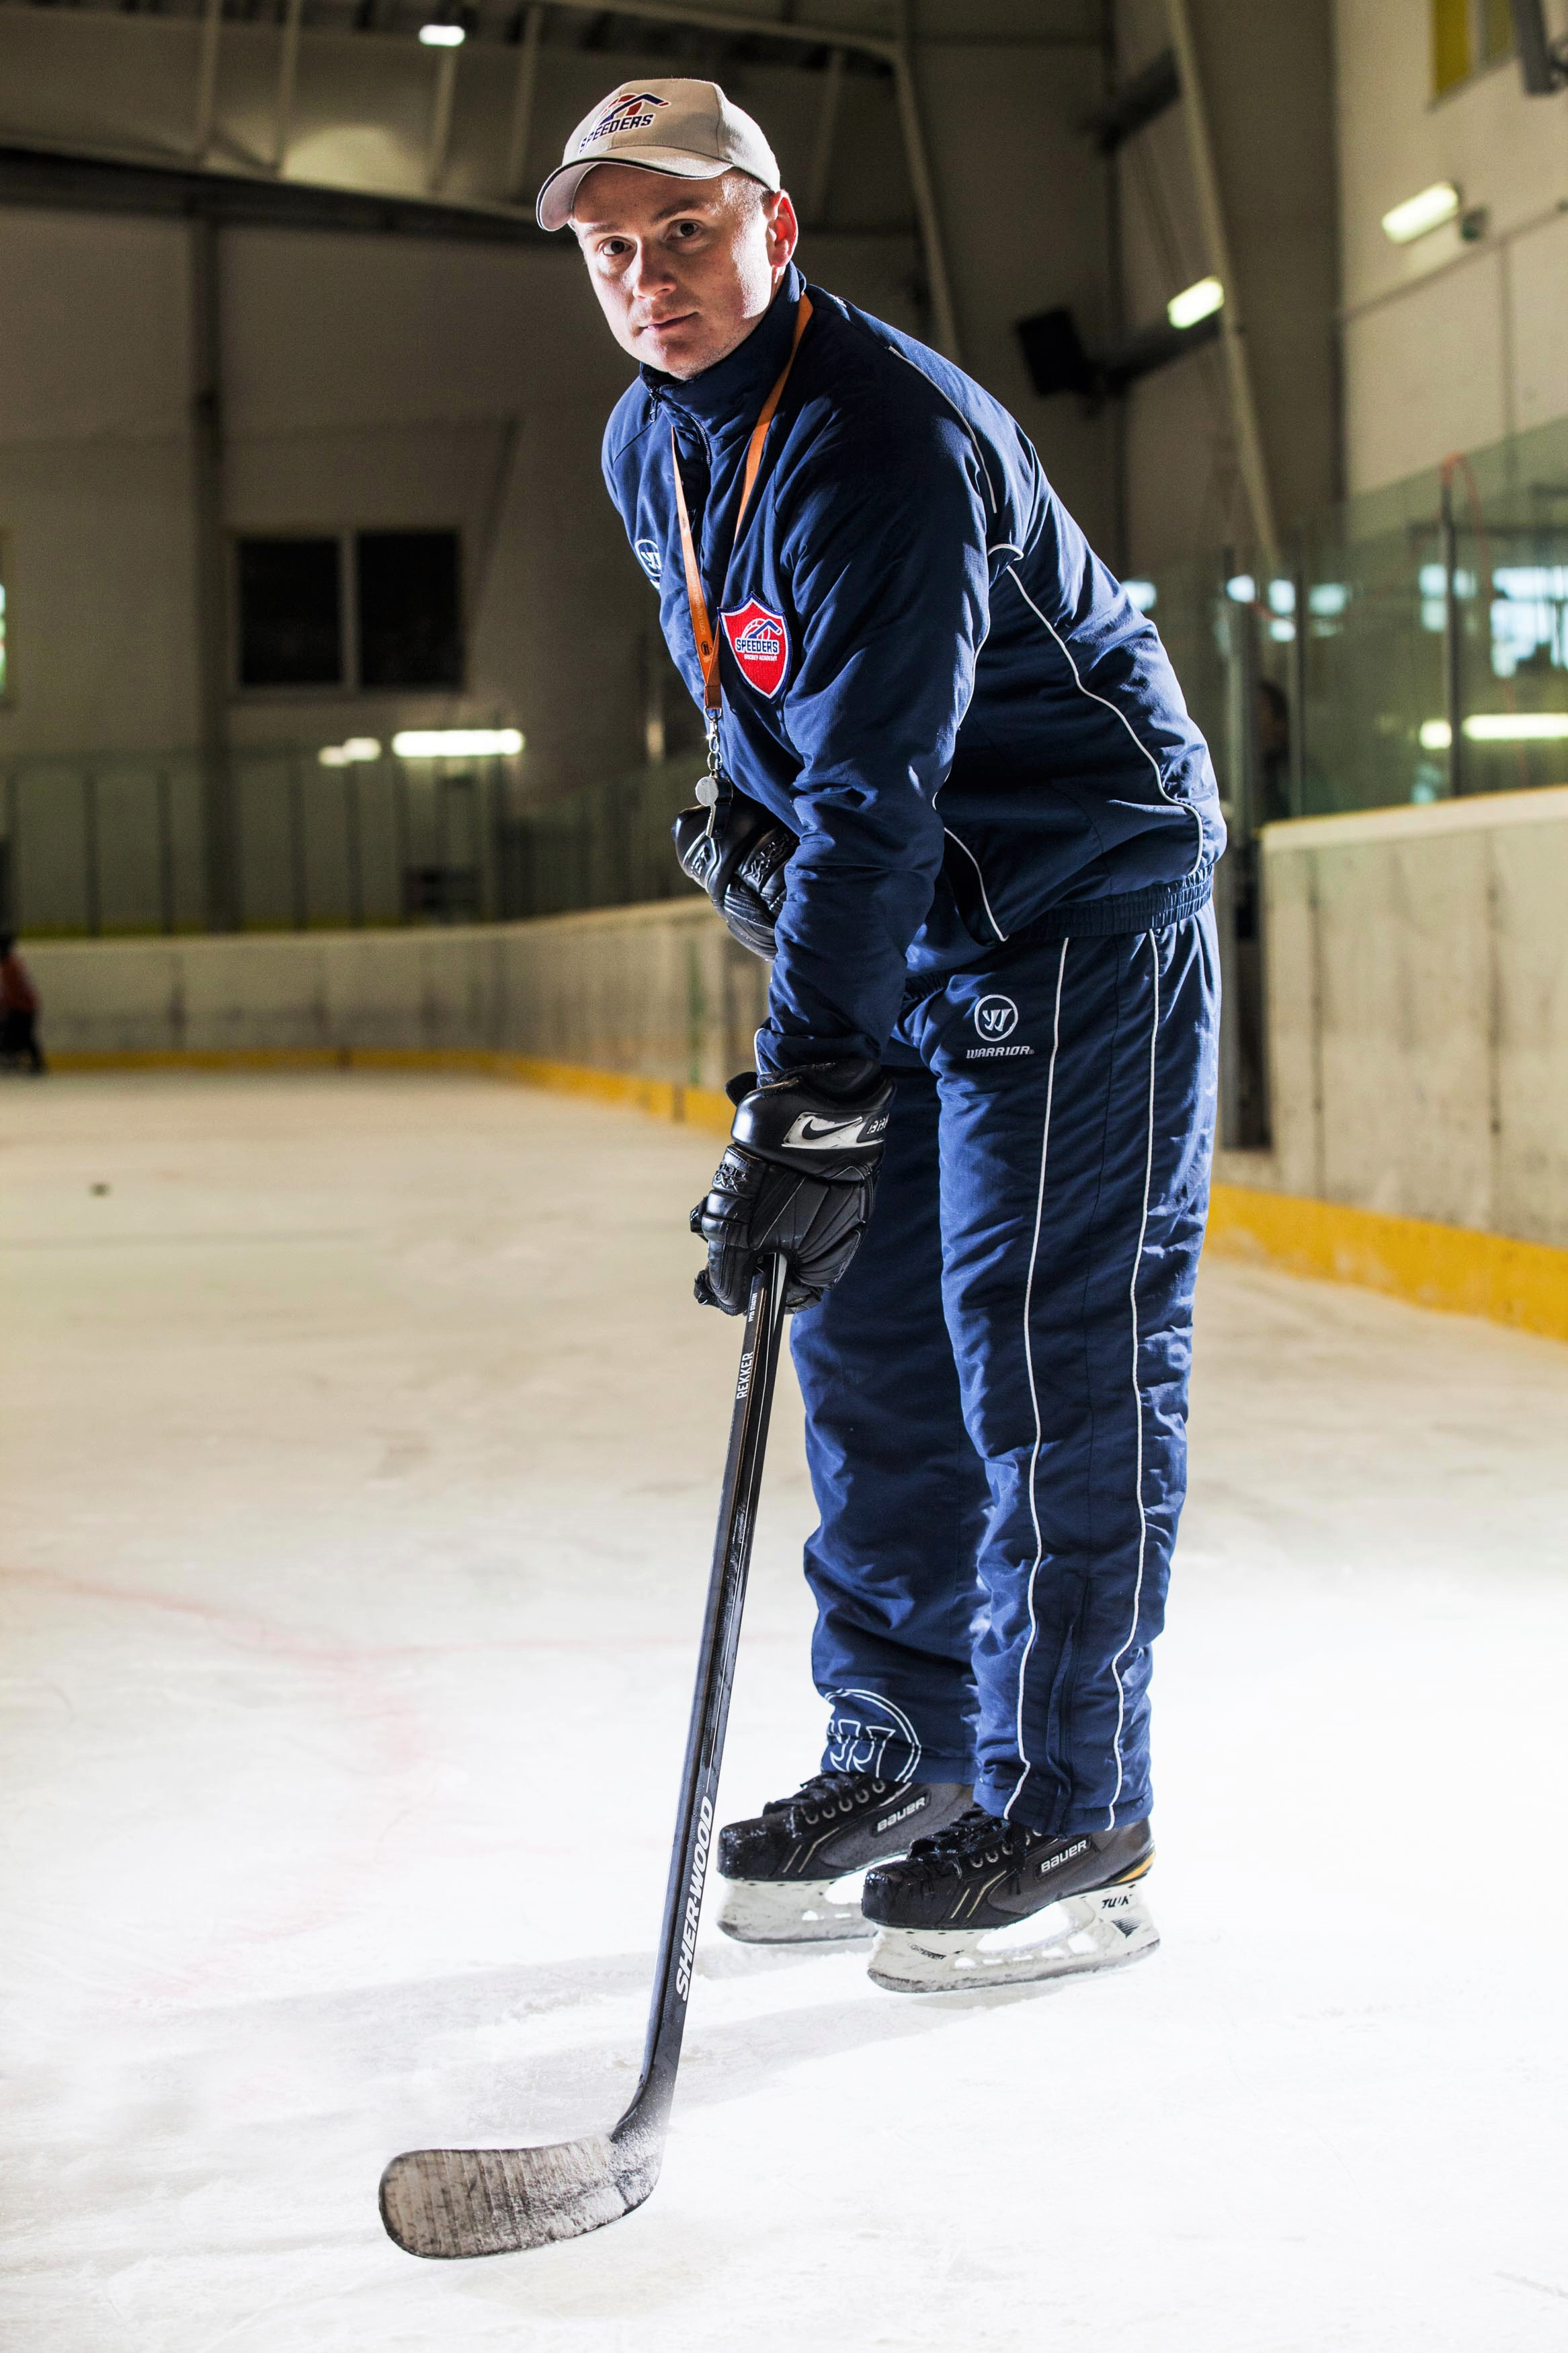 Ivan Kovalik speeders bratislava trener hokejovy postoj